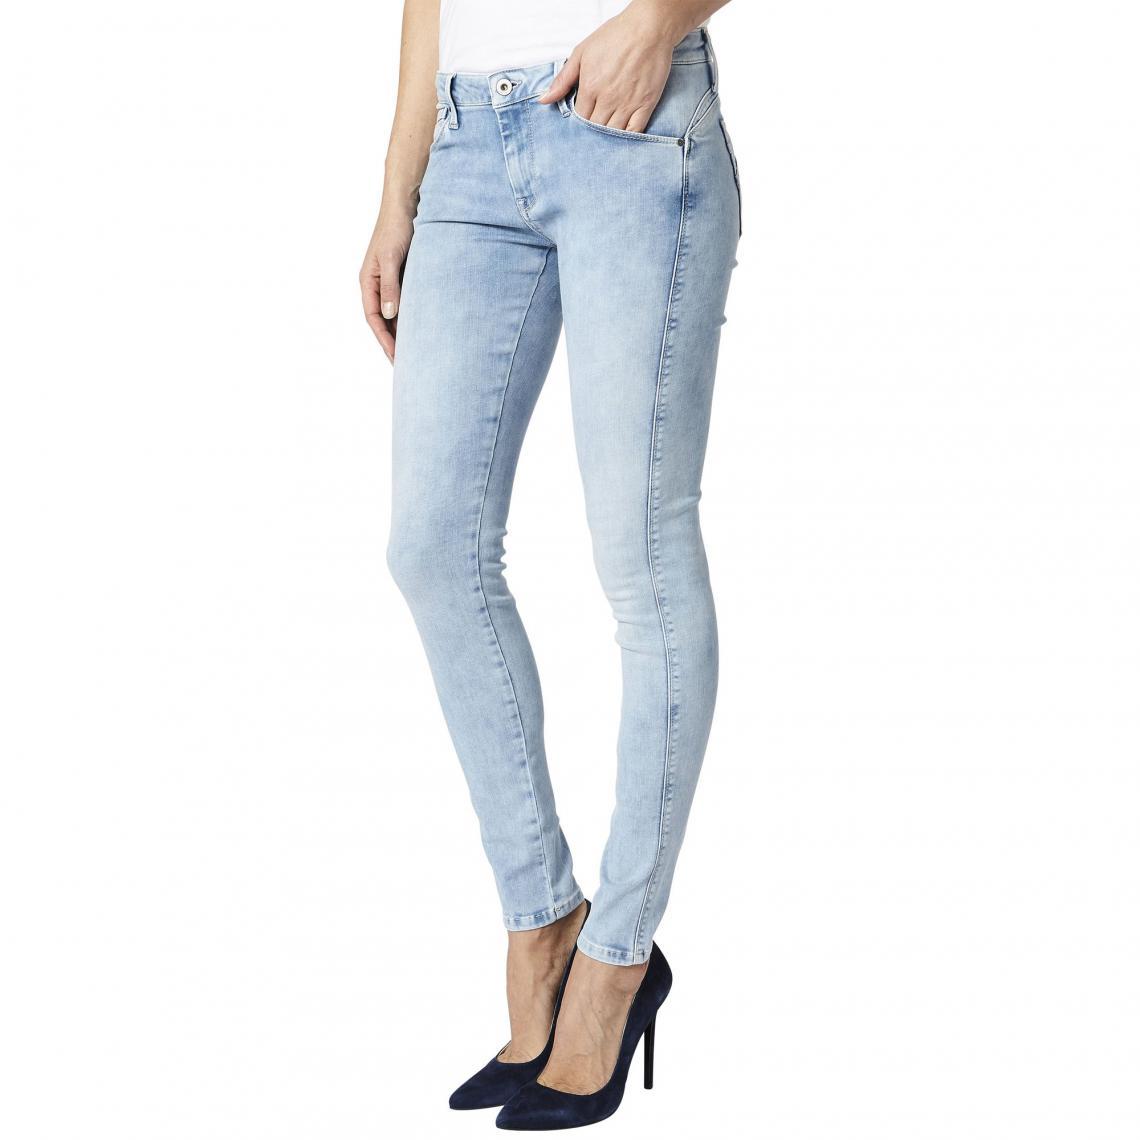 29cc5327f0d Jean skinny femme US 30 Aero Pepe Jeans - Bleu Pepe Jeans Femme